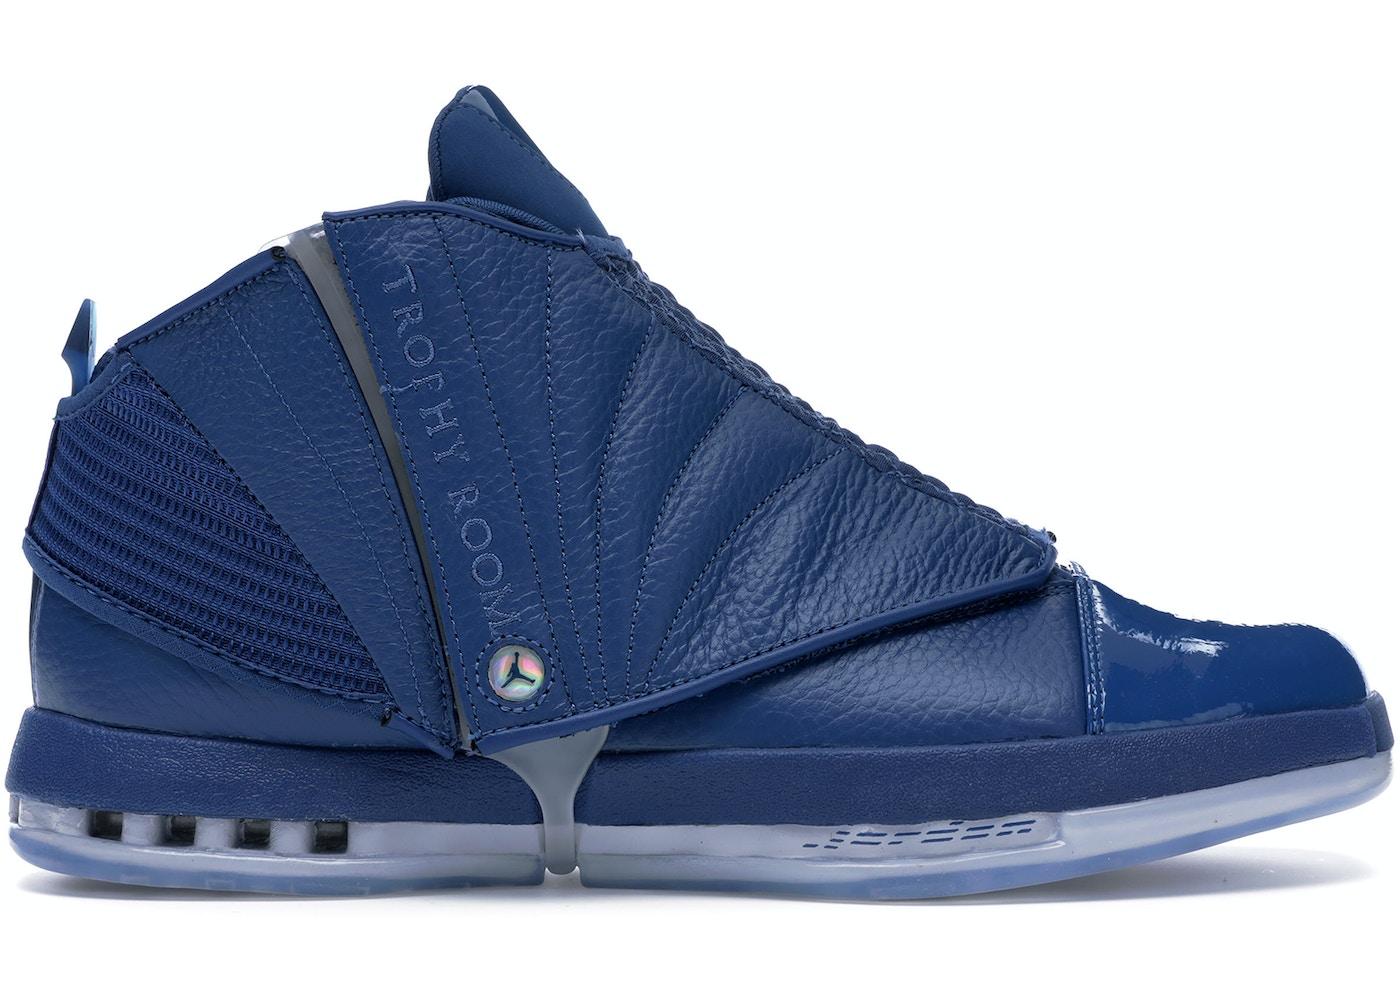 12339b94962c Jordan 16 Retro Trophy Room French Blue - 854255-416